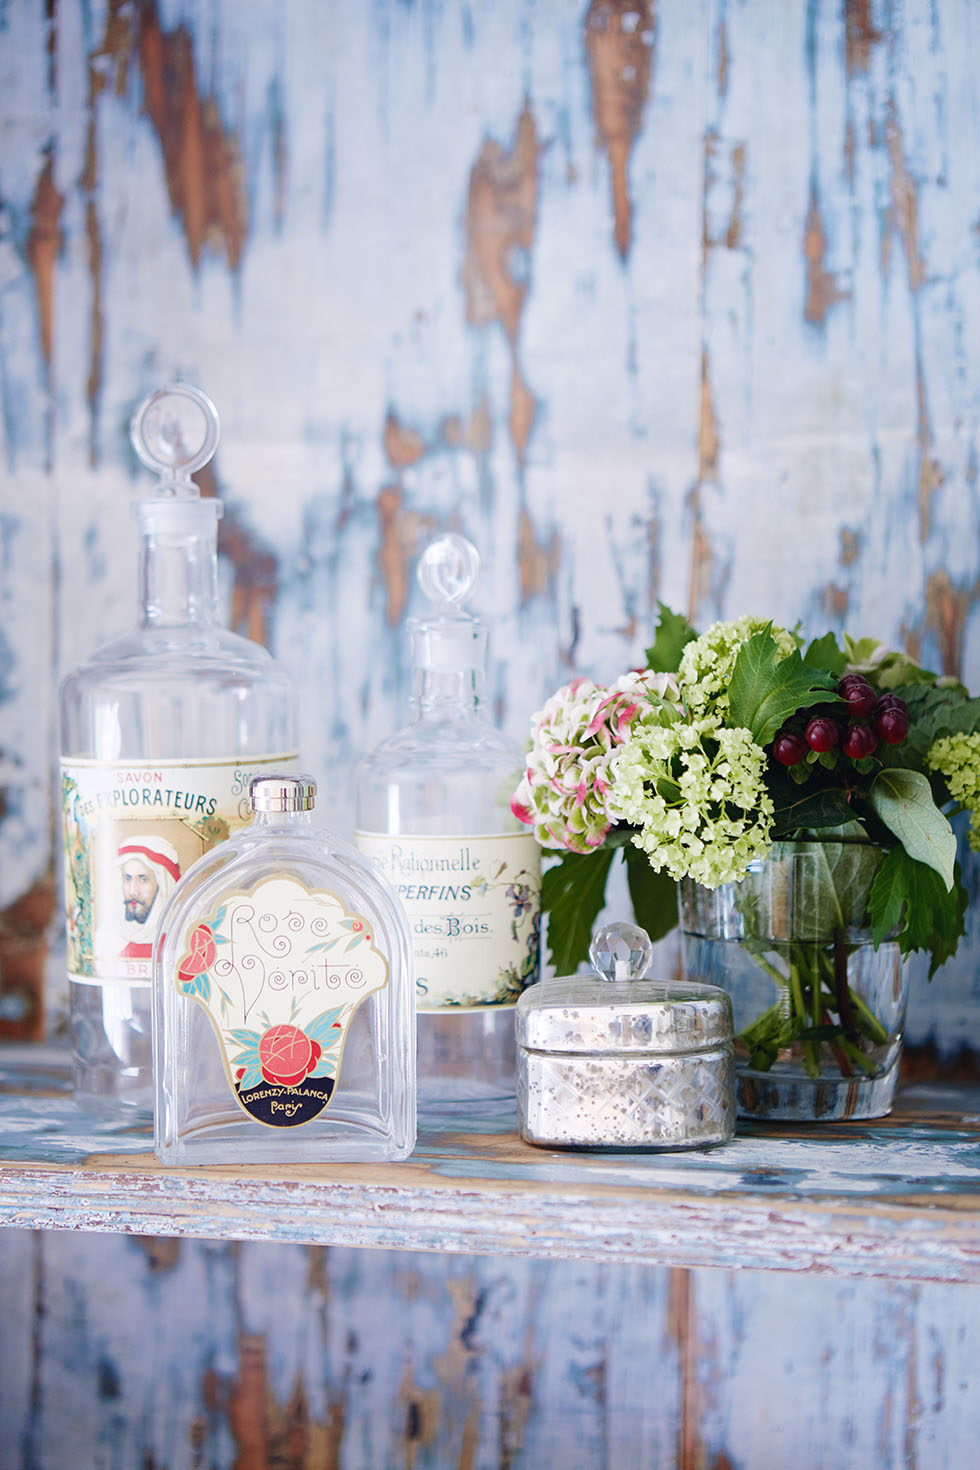 kemink-decorative-glassware